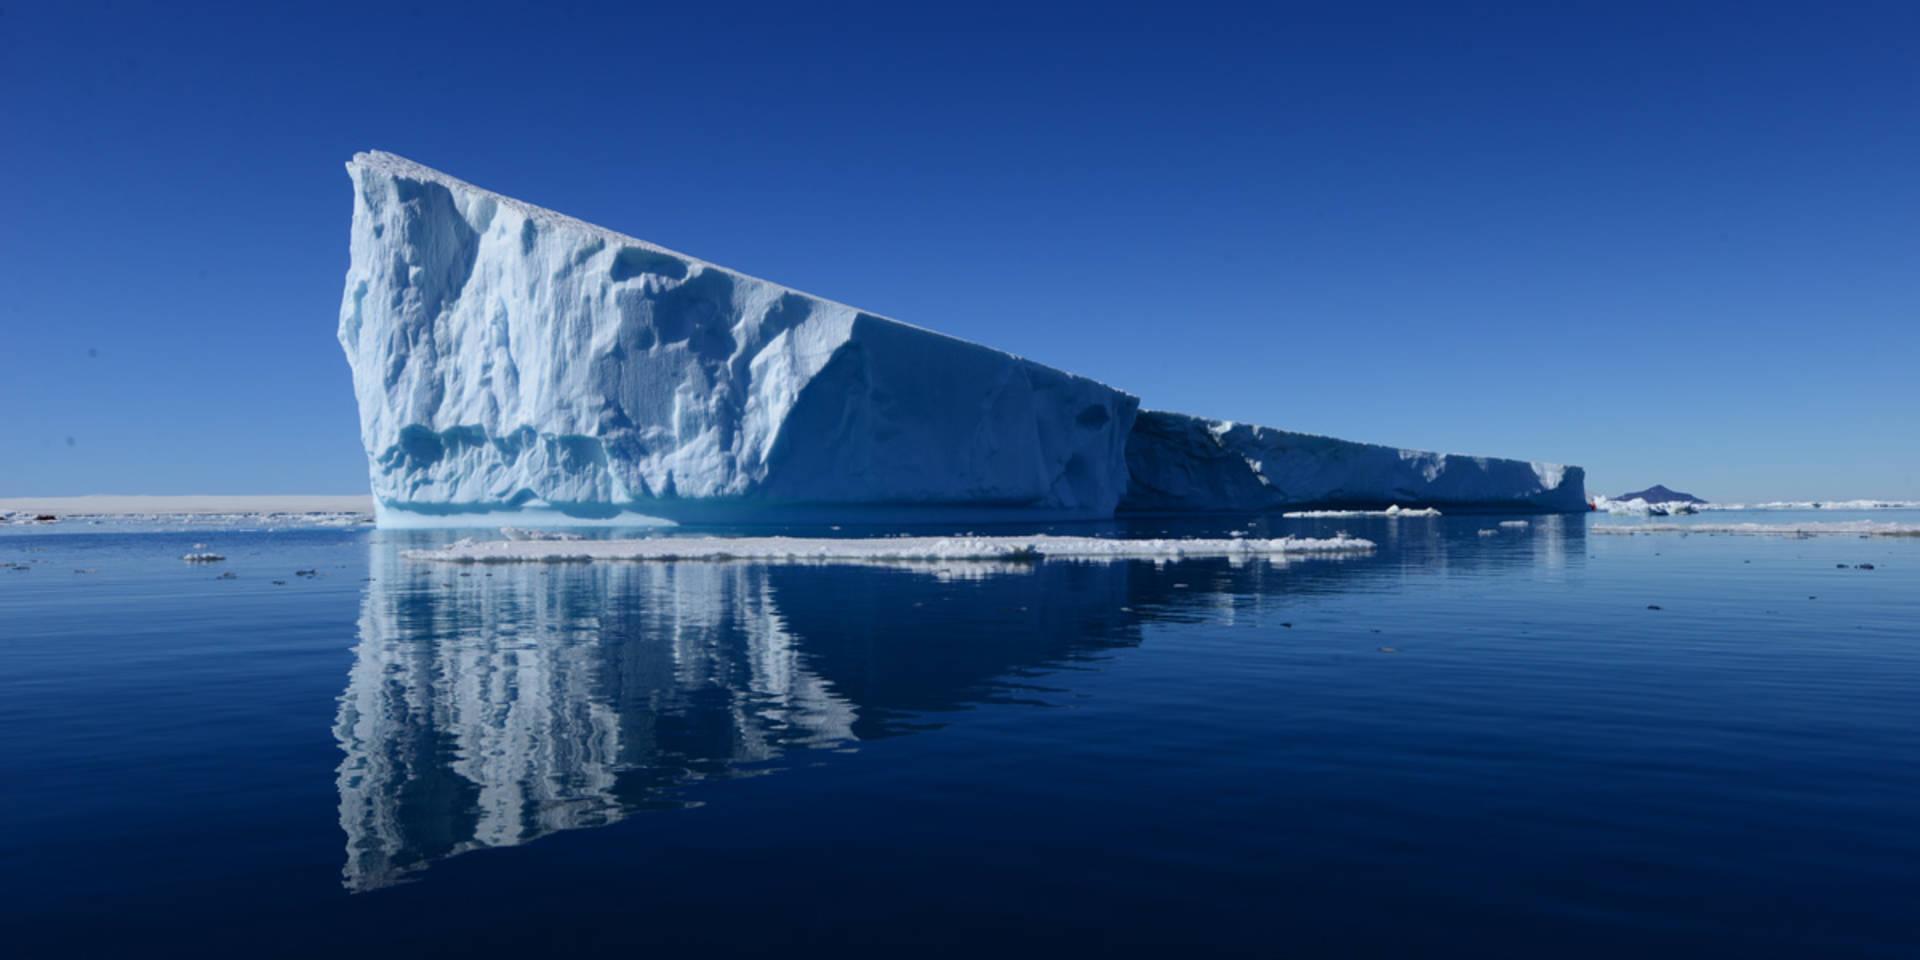 Arktis Kreuzfahrten